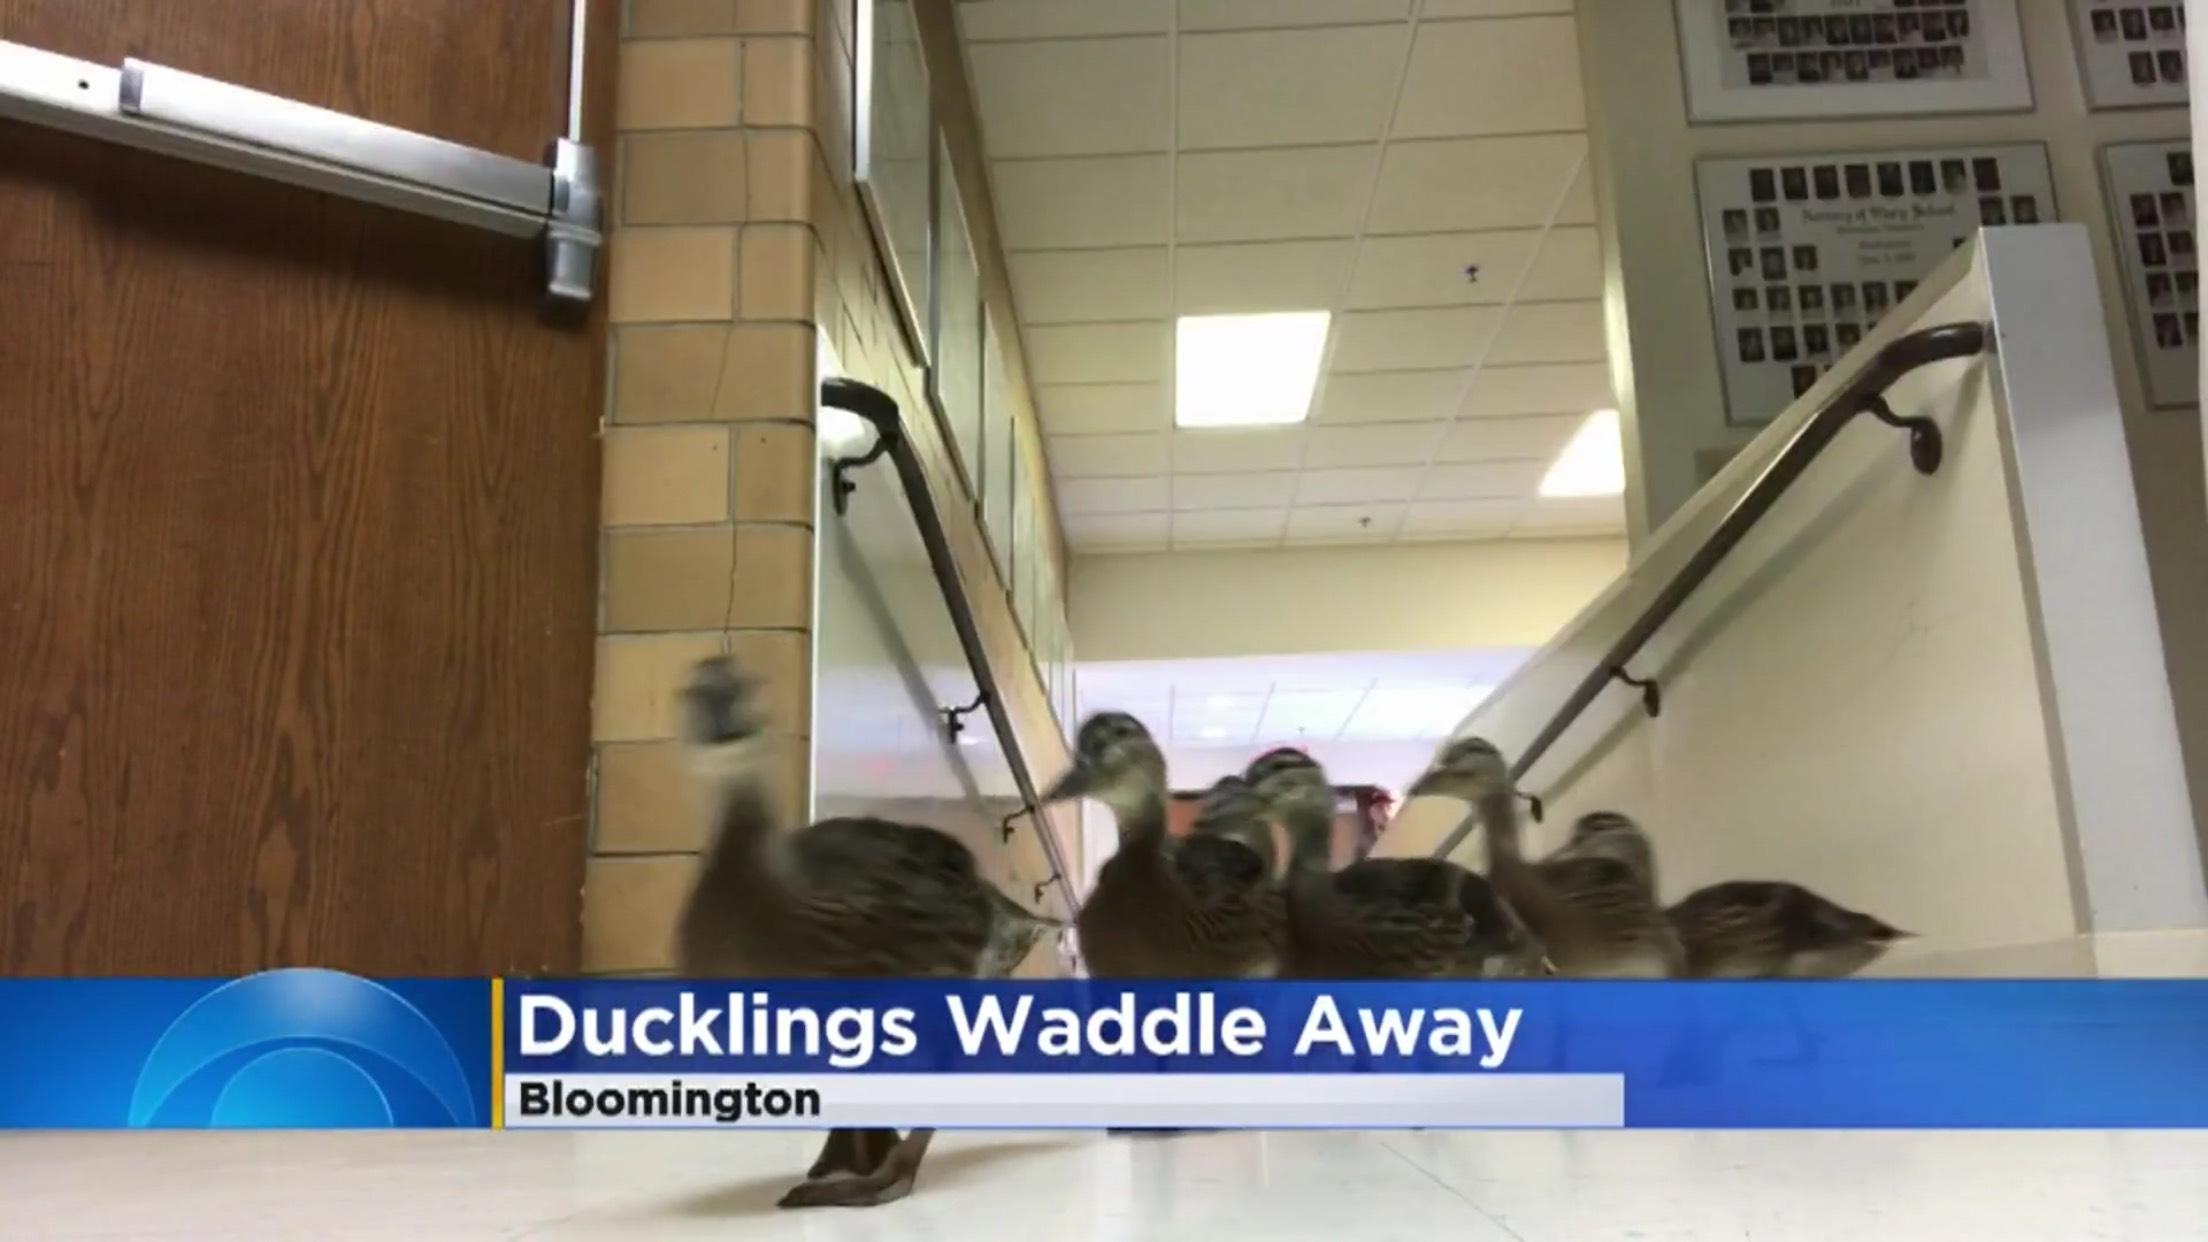 Ducklings Waddle Away